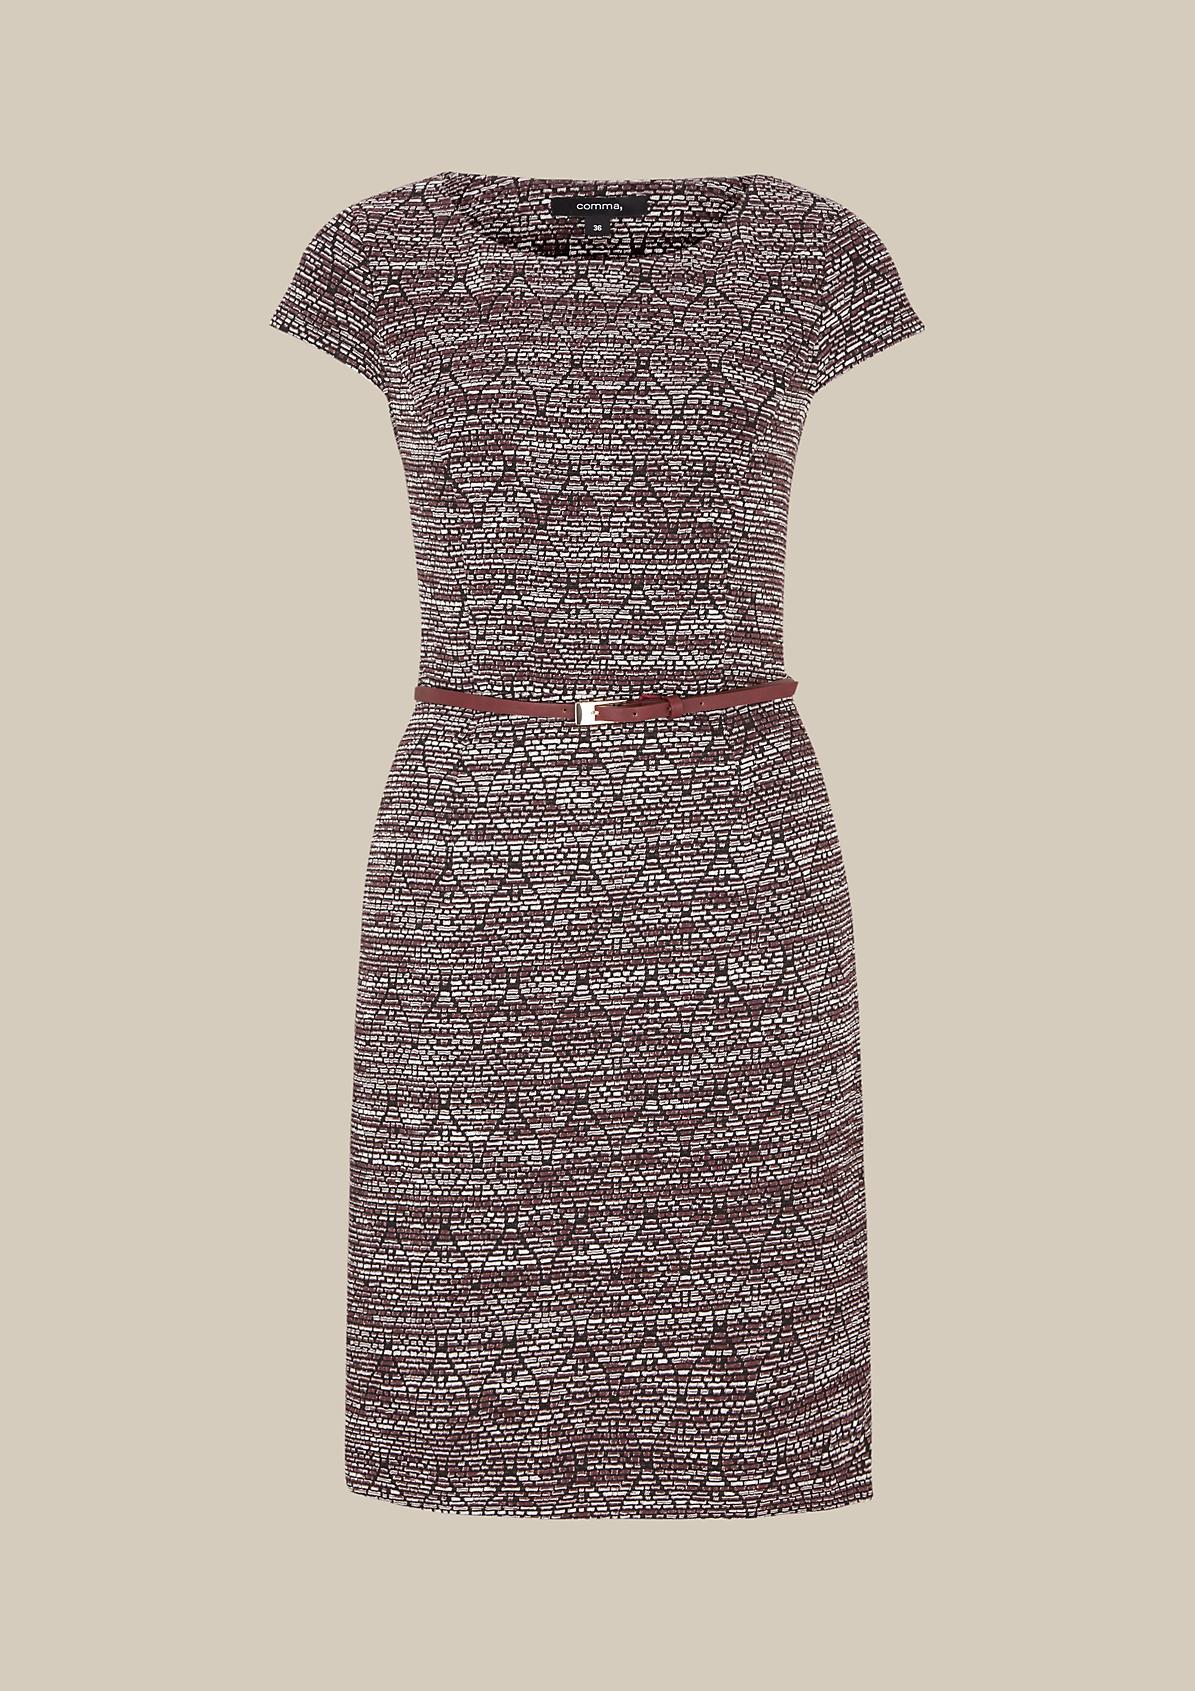 Edles Kleid mit aufregendem Jacquardmuster